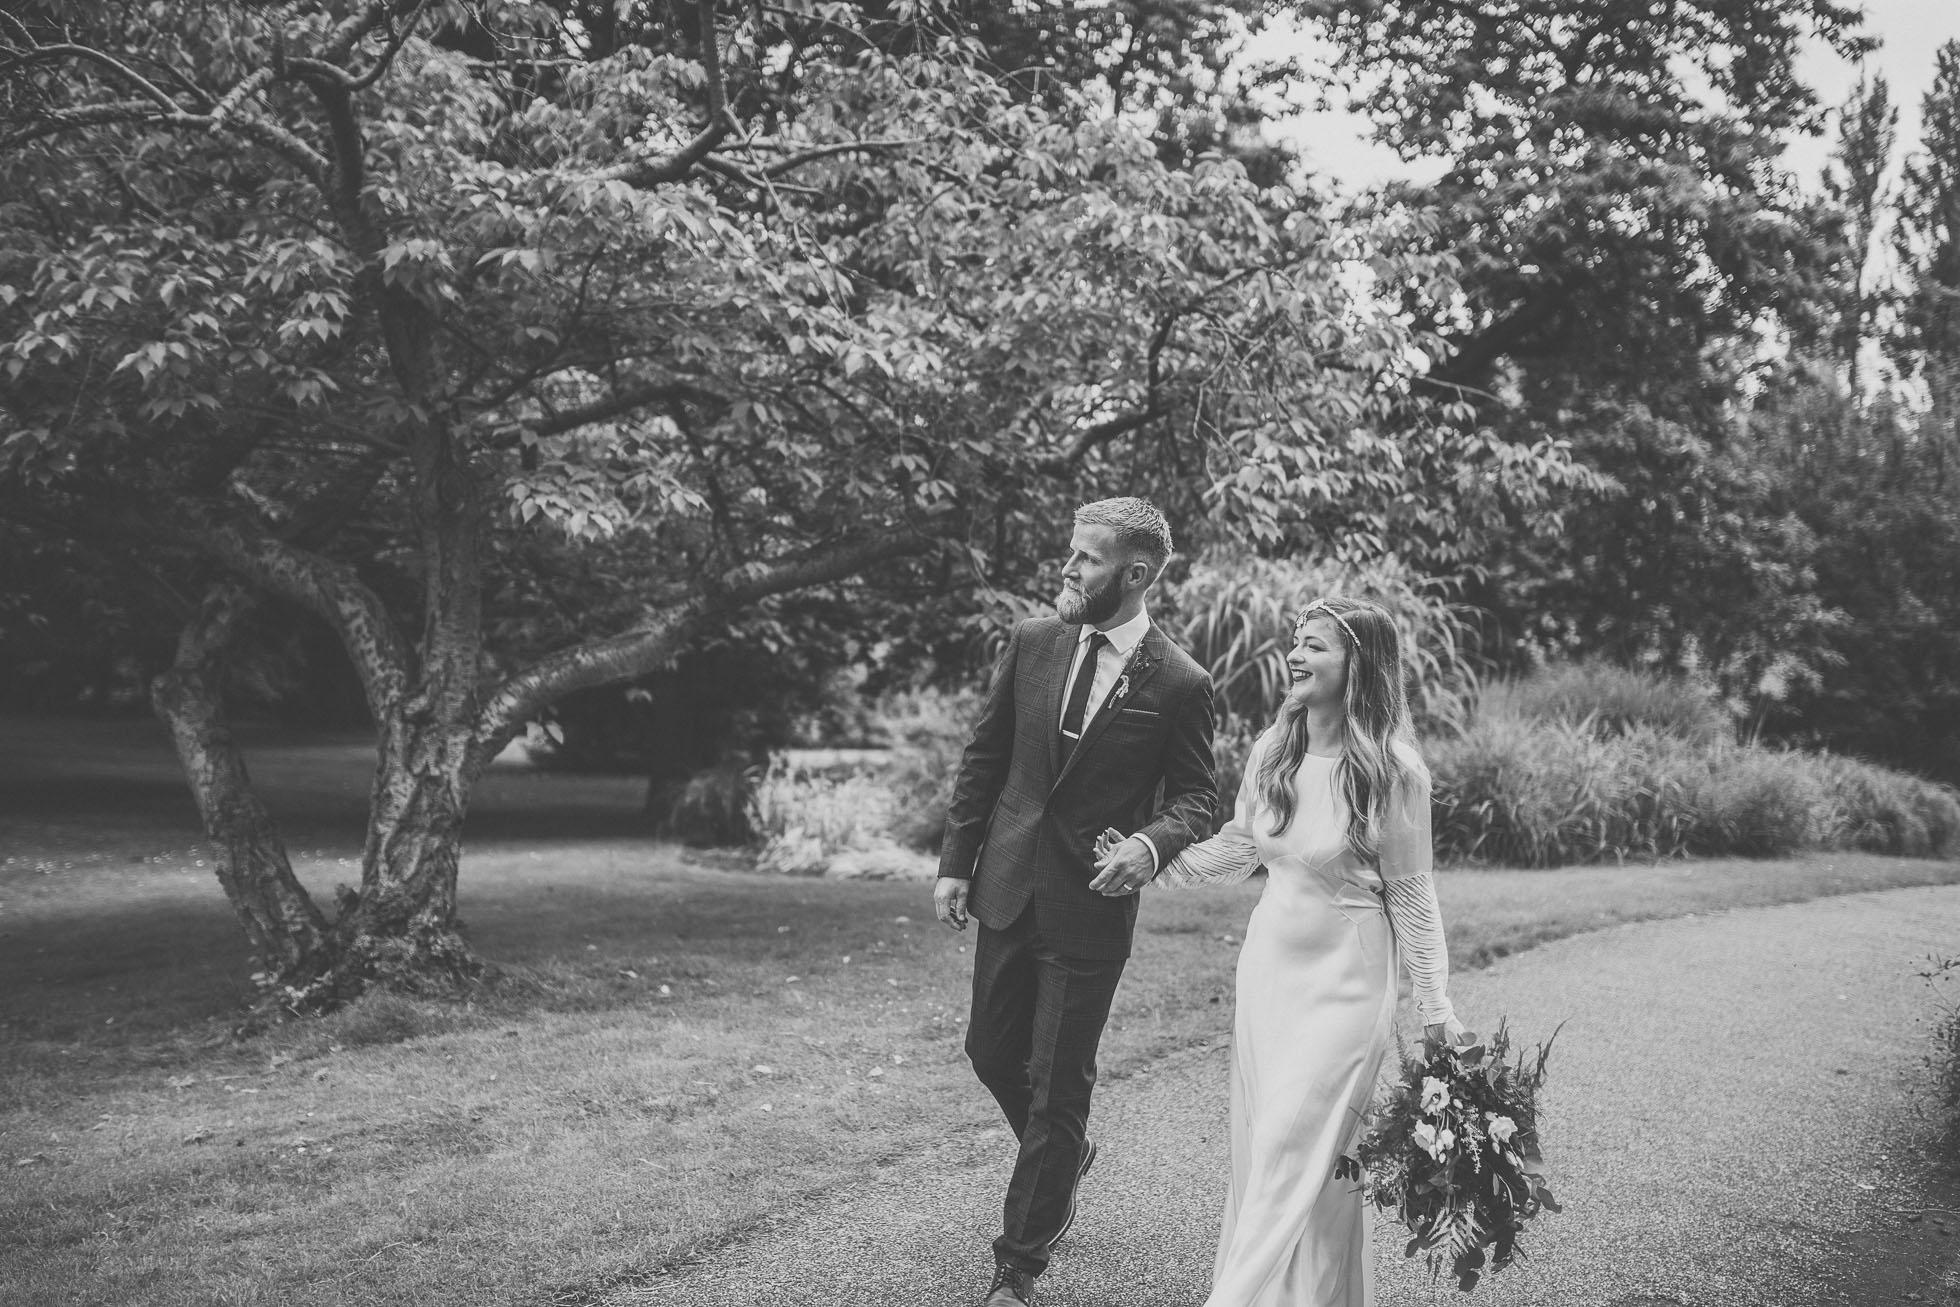 sheffield-botanical-gardens-wedding-photographer-39.jpg